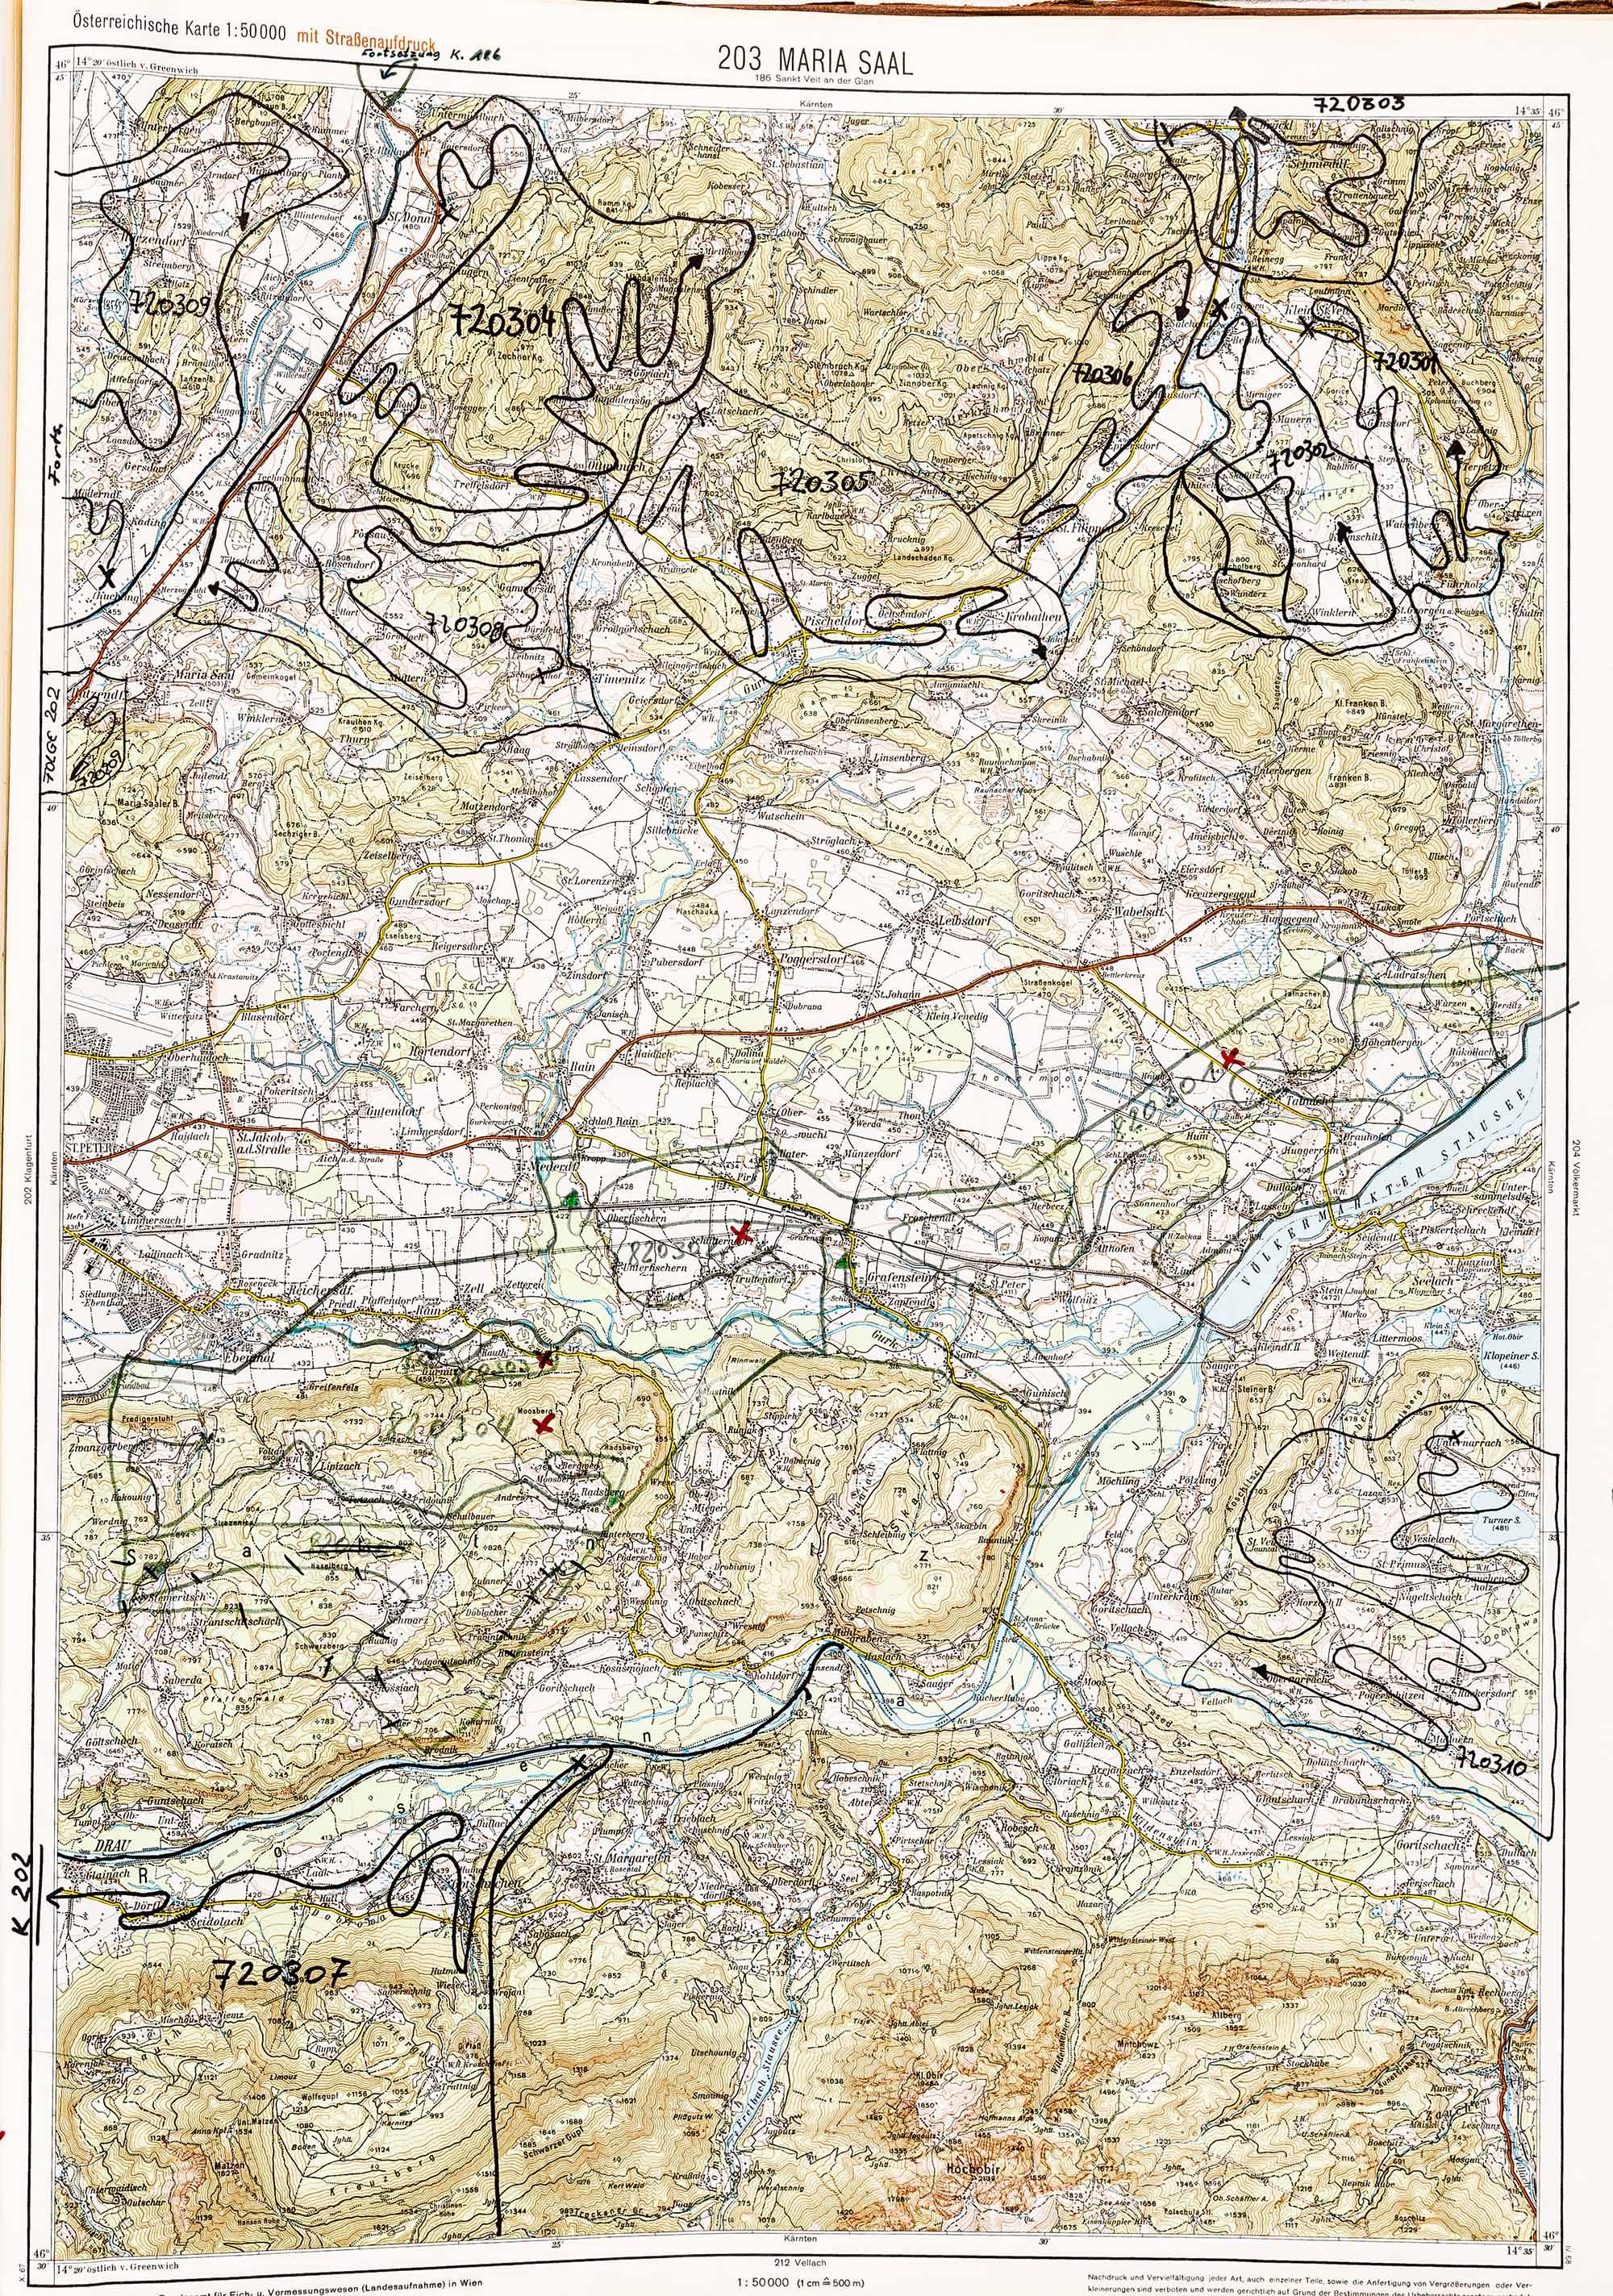 1975-1979 Karte 203